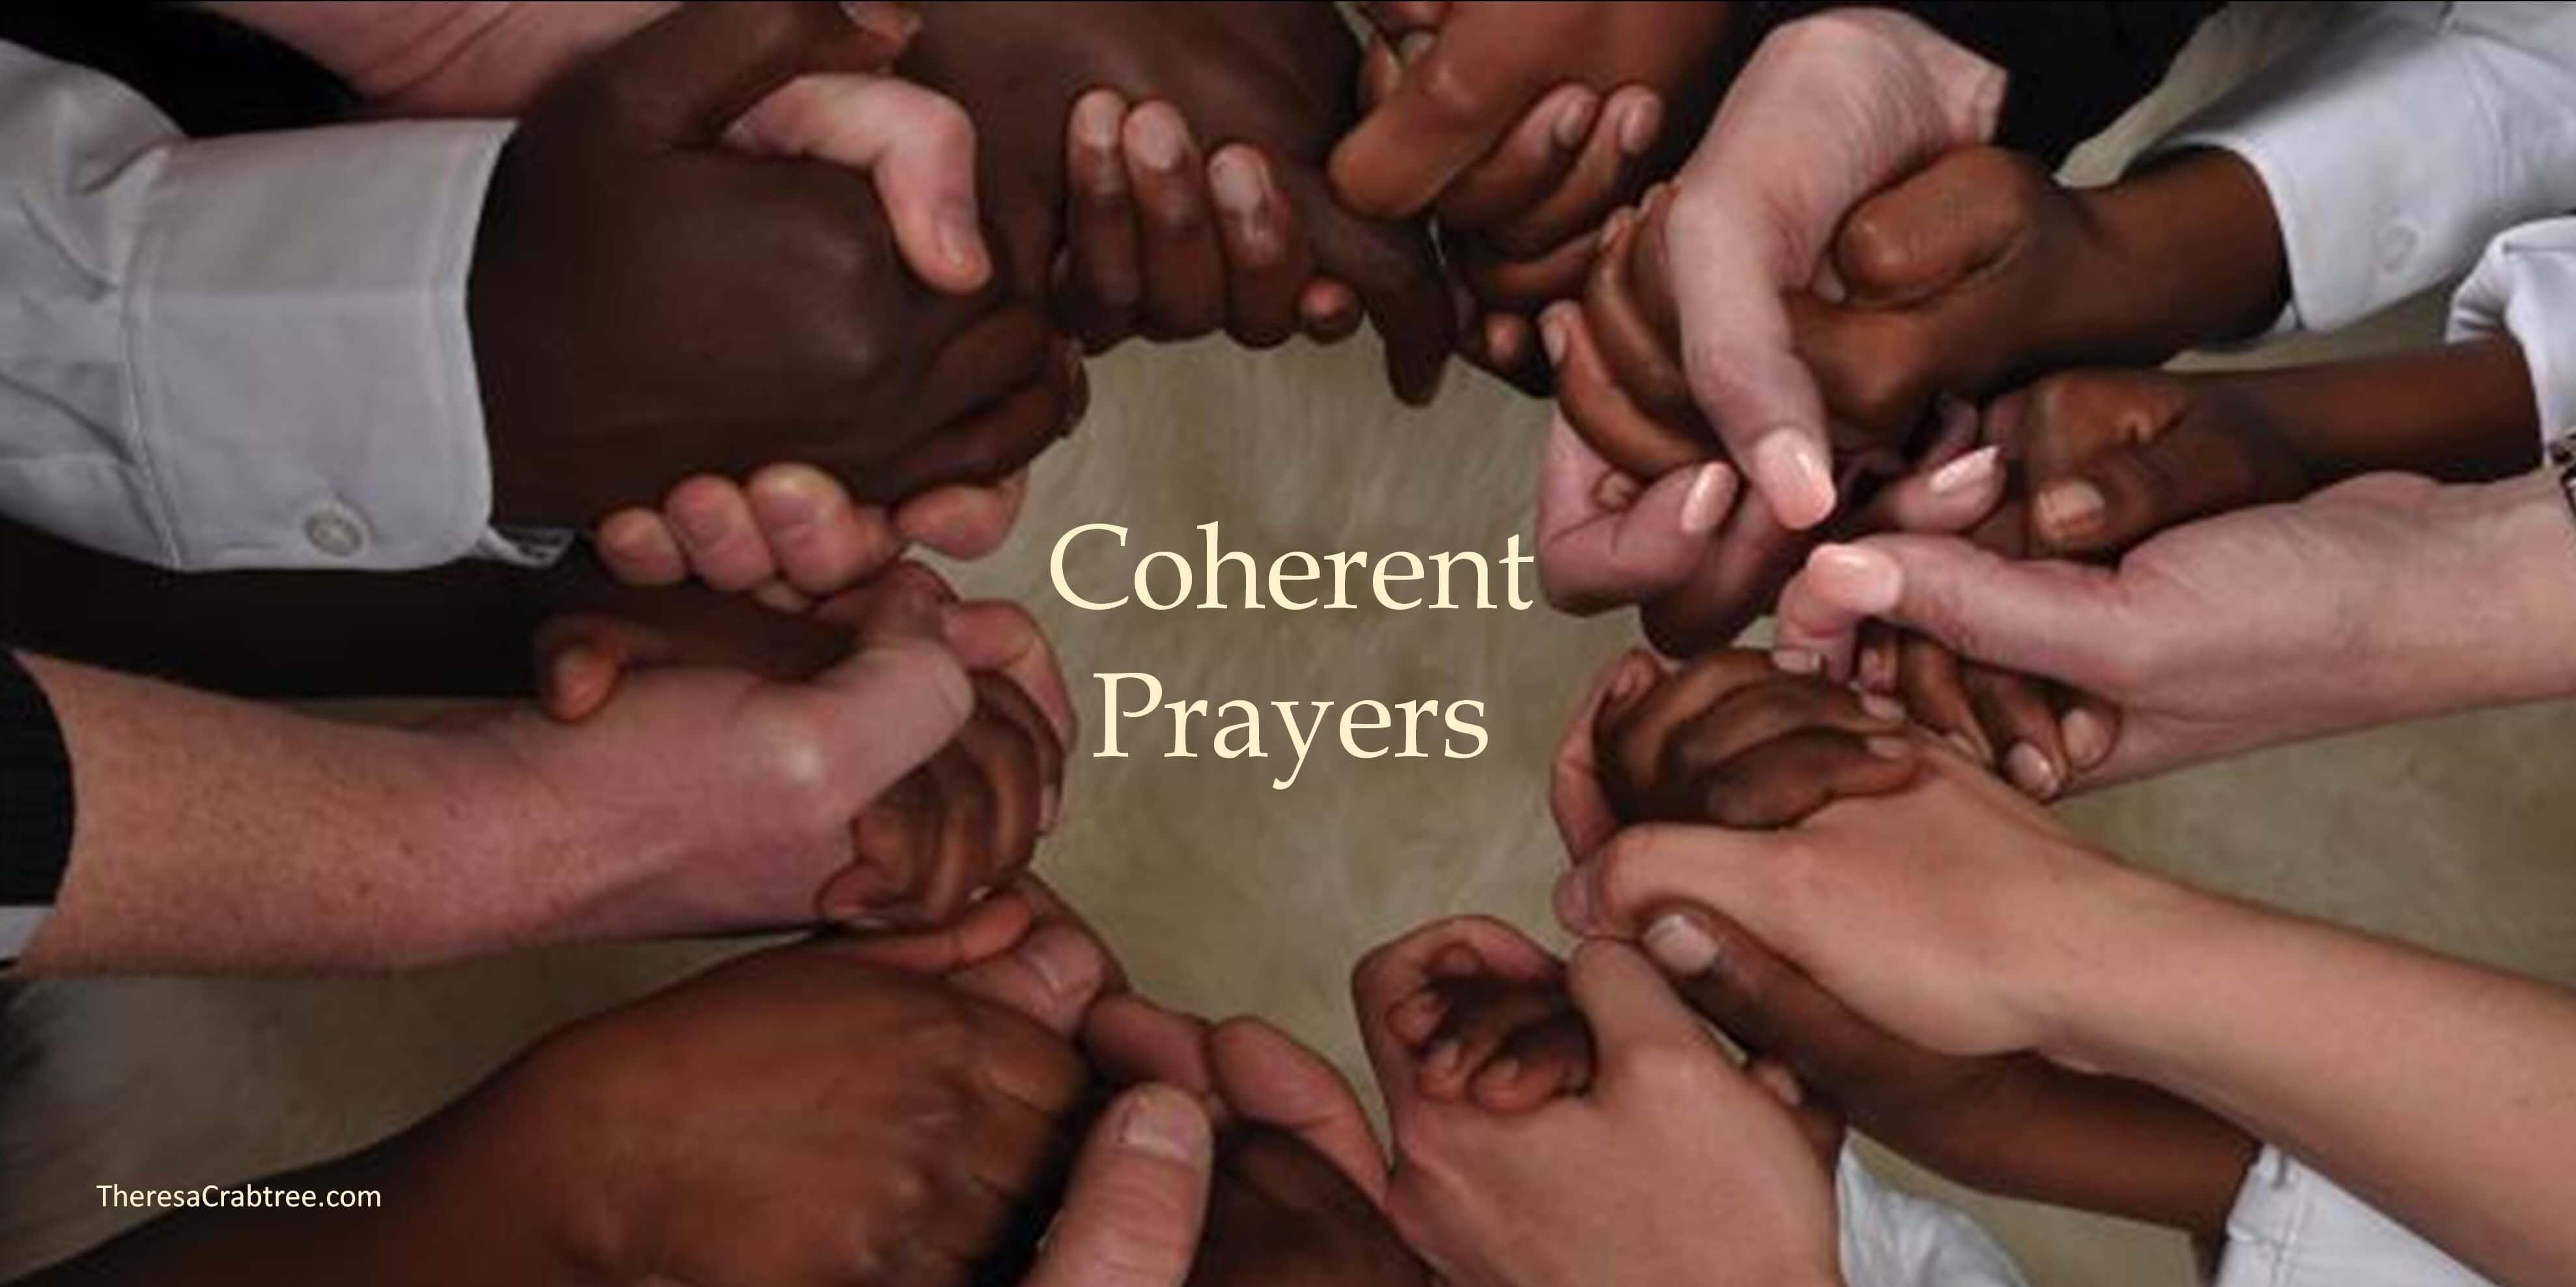 Coherent Prayers